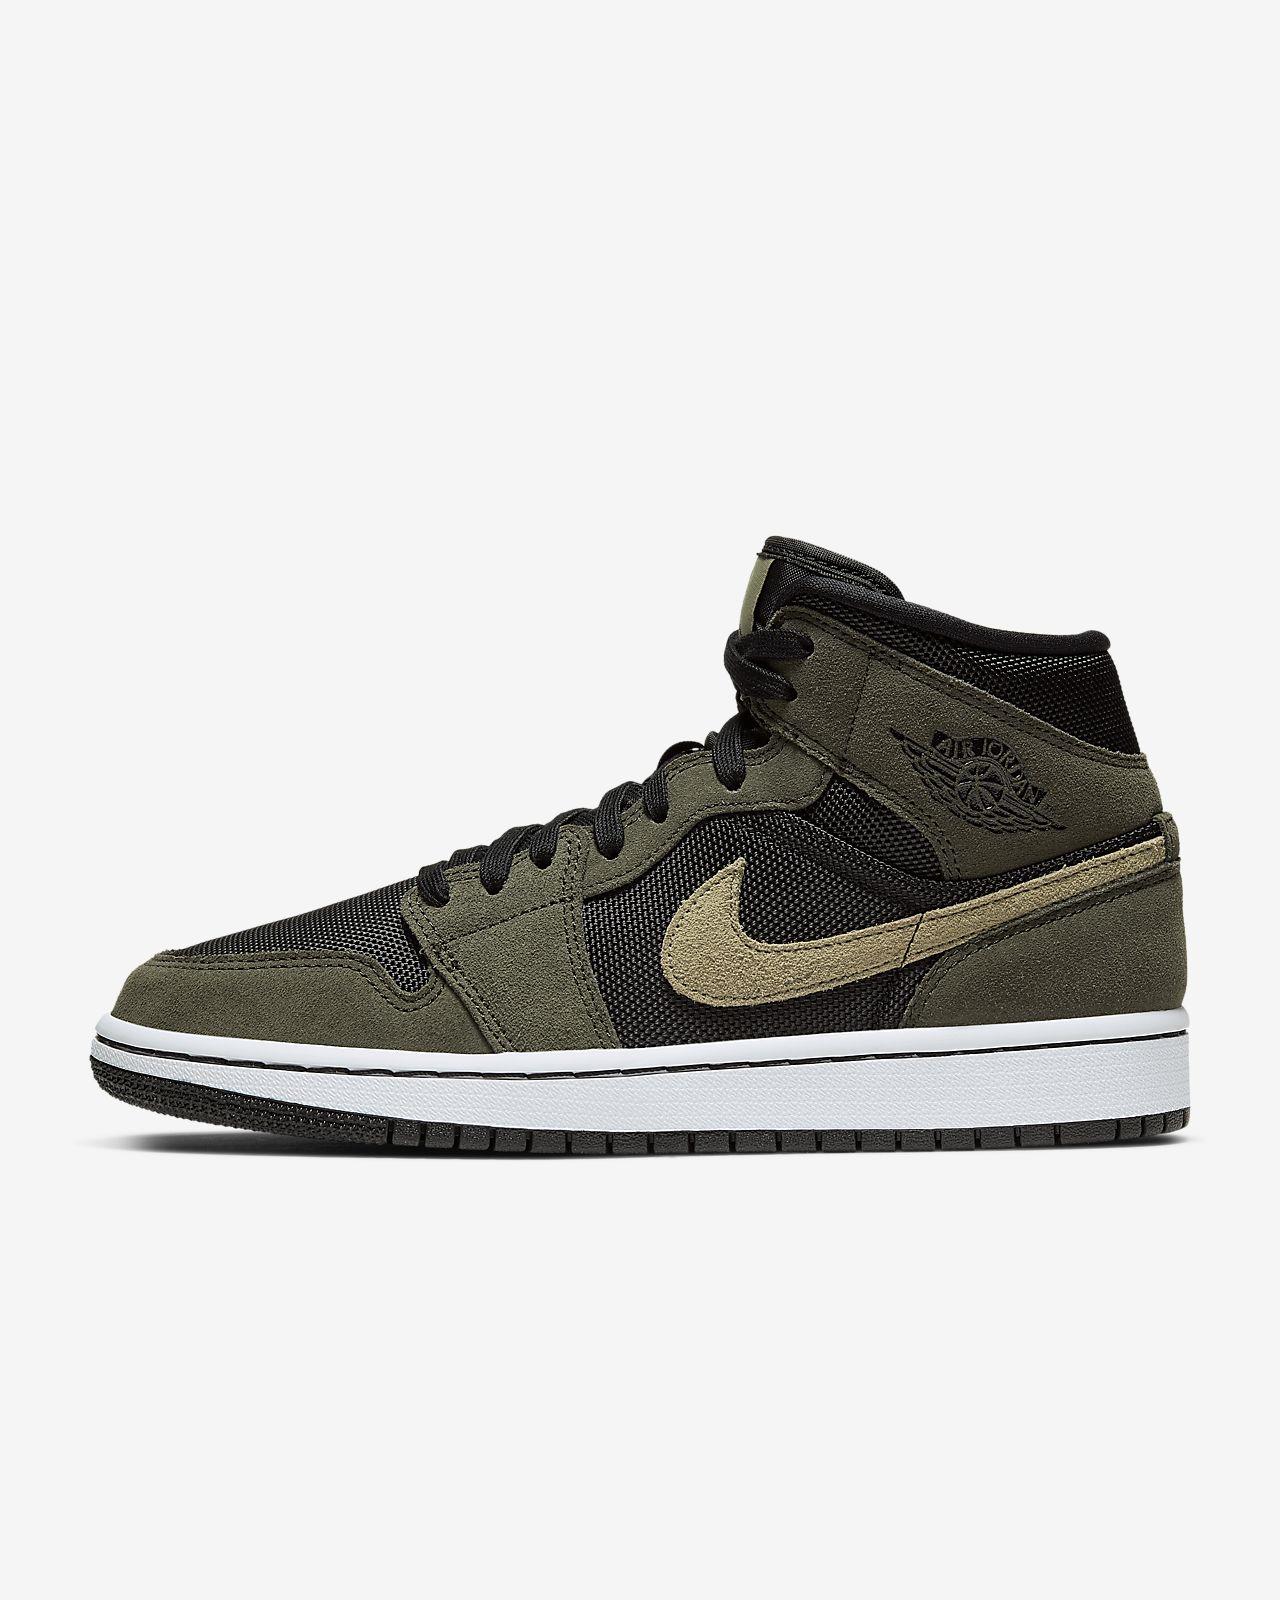 Nike Air Jordan 1 Mid Boys Mens Trainers SNEAKERS Shoes UK 5 EUR 38